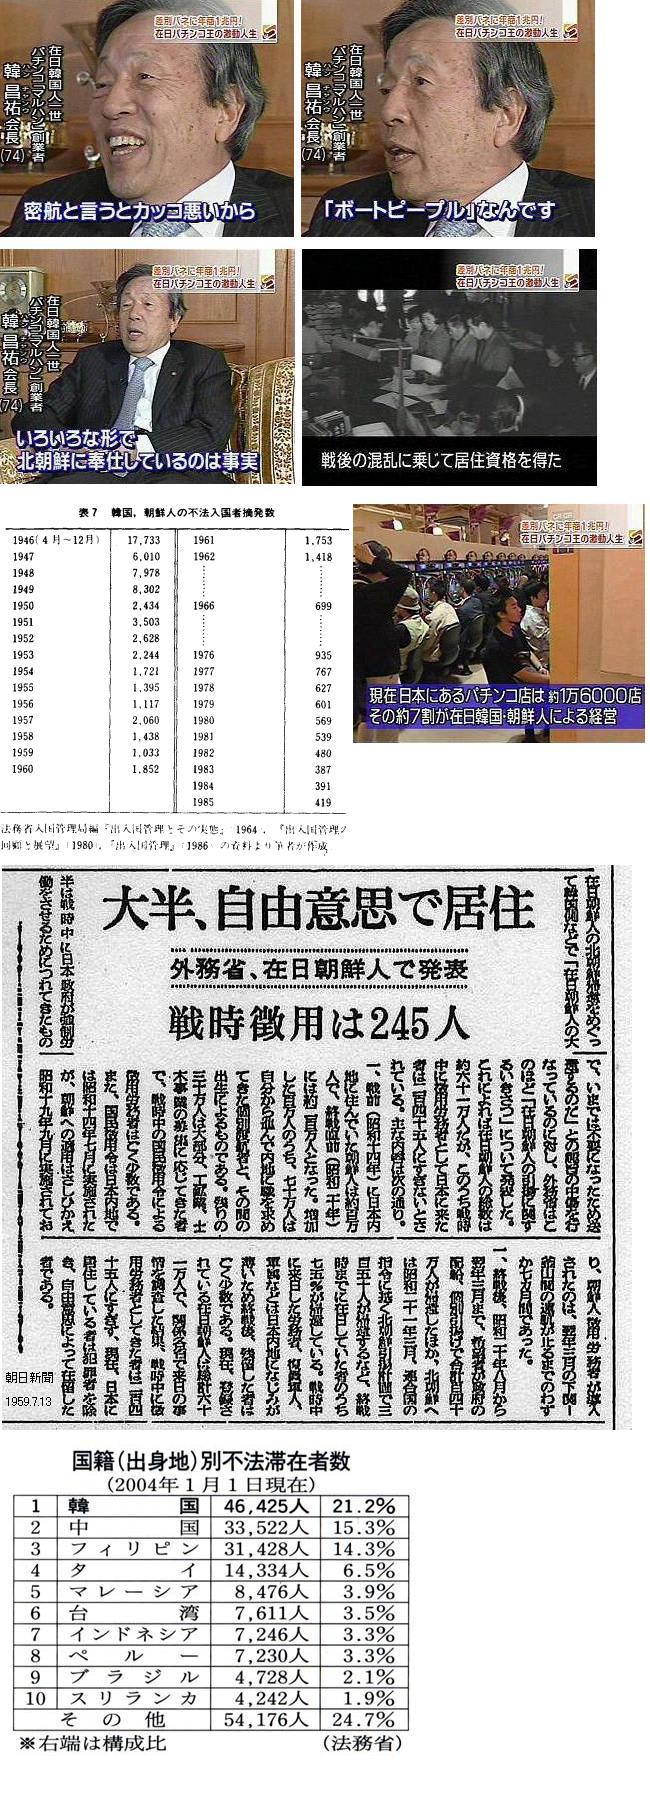 http://blogimg.goo.ne.jp/user_image/77/24/90da8f8546636dac0f2f48940d428864.jpg